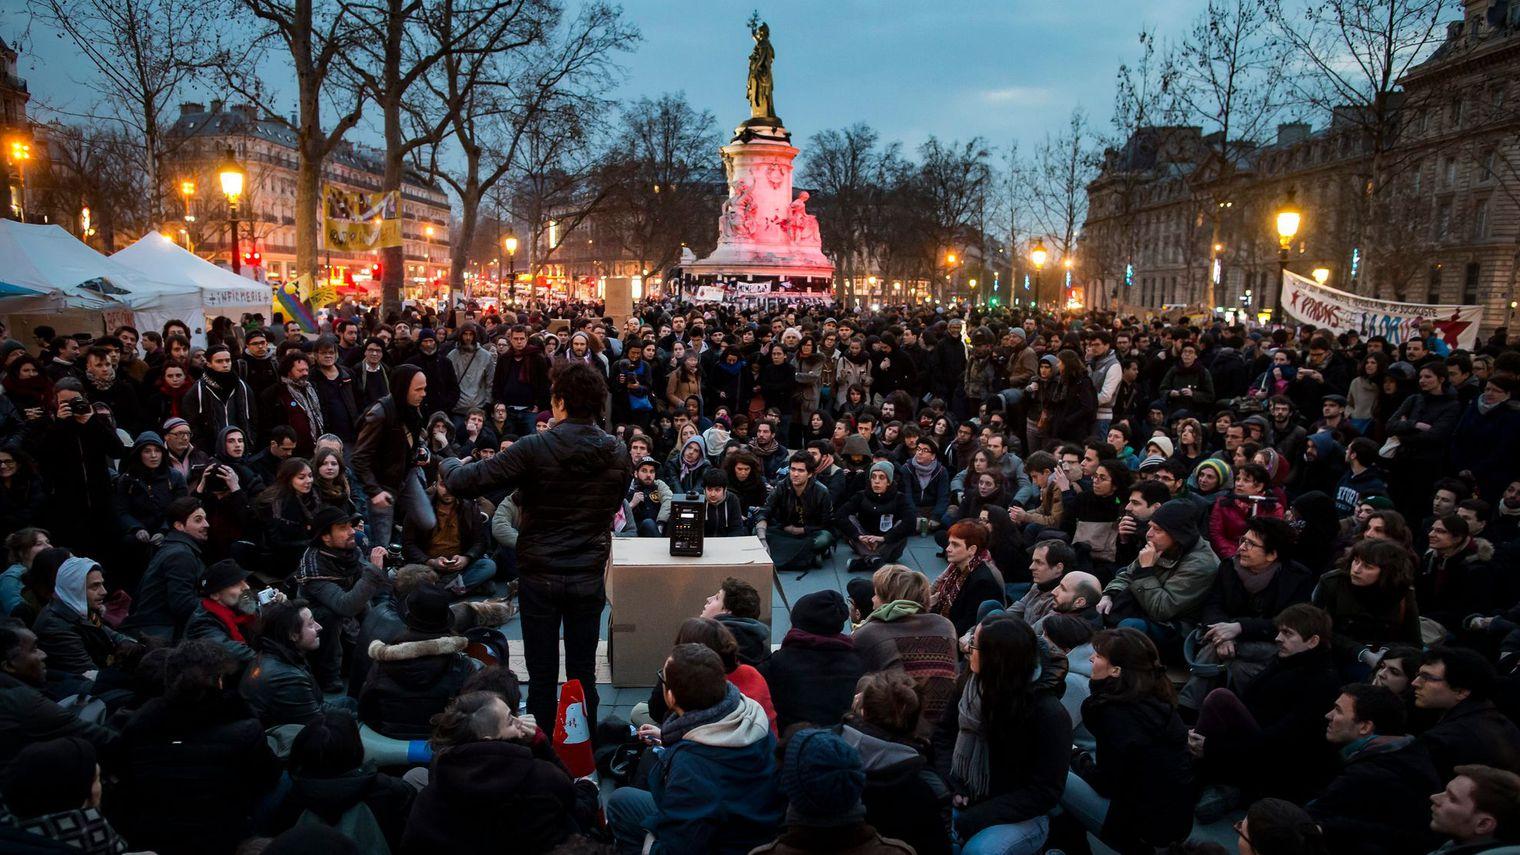 Nuit Debout: piattaforma (tecno)politica per un movimento europeo?